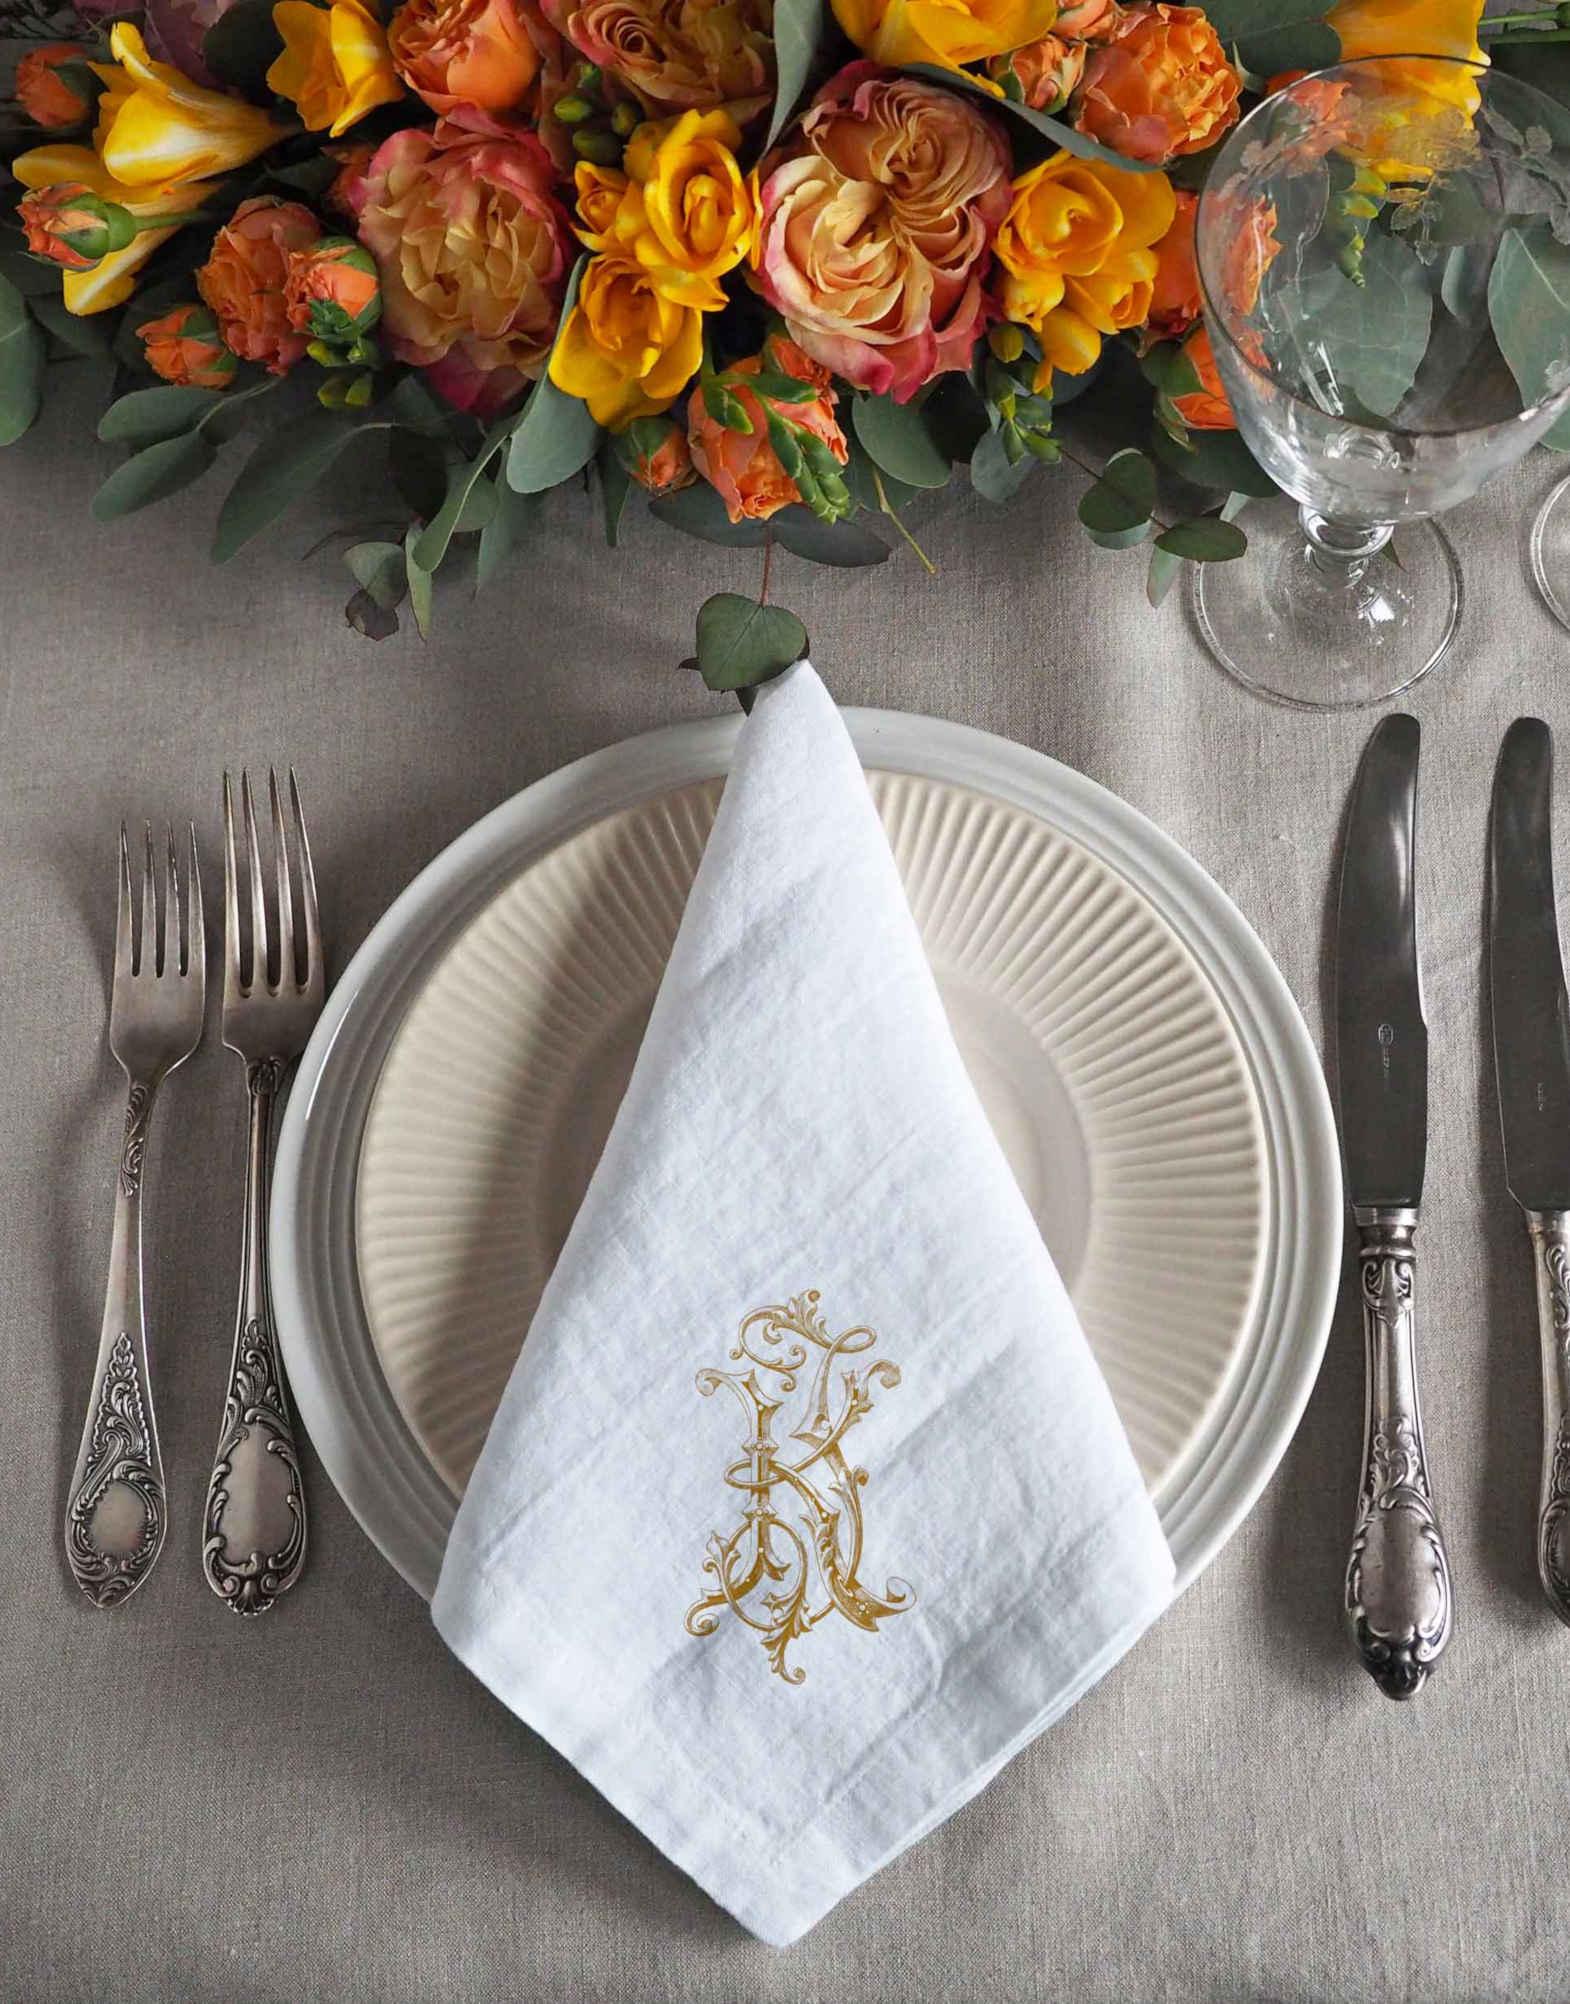 Custom Printed Monogrammed Linen Wedding Party Napkins 100 Linen Linoroom